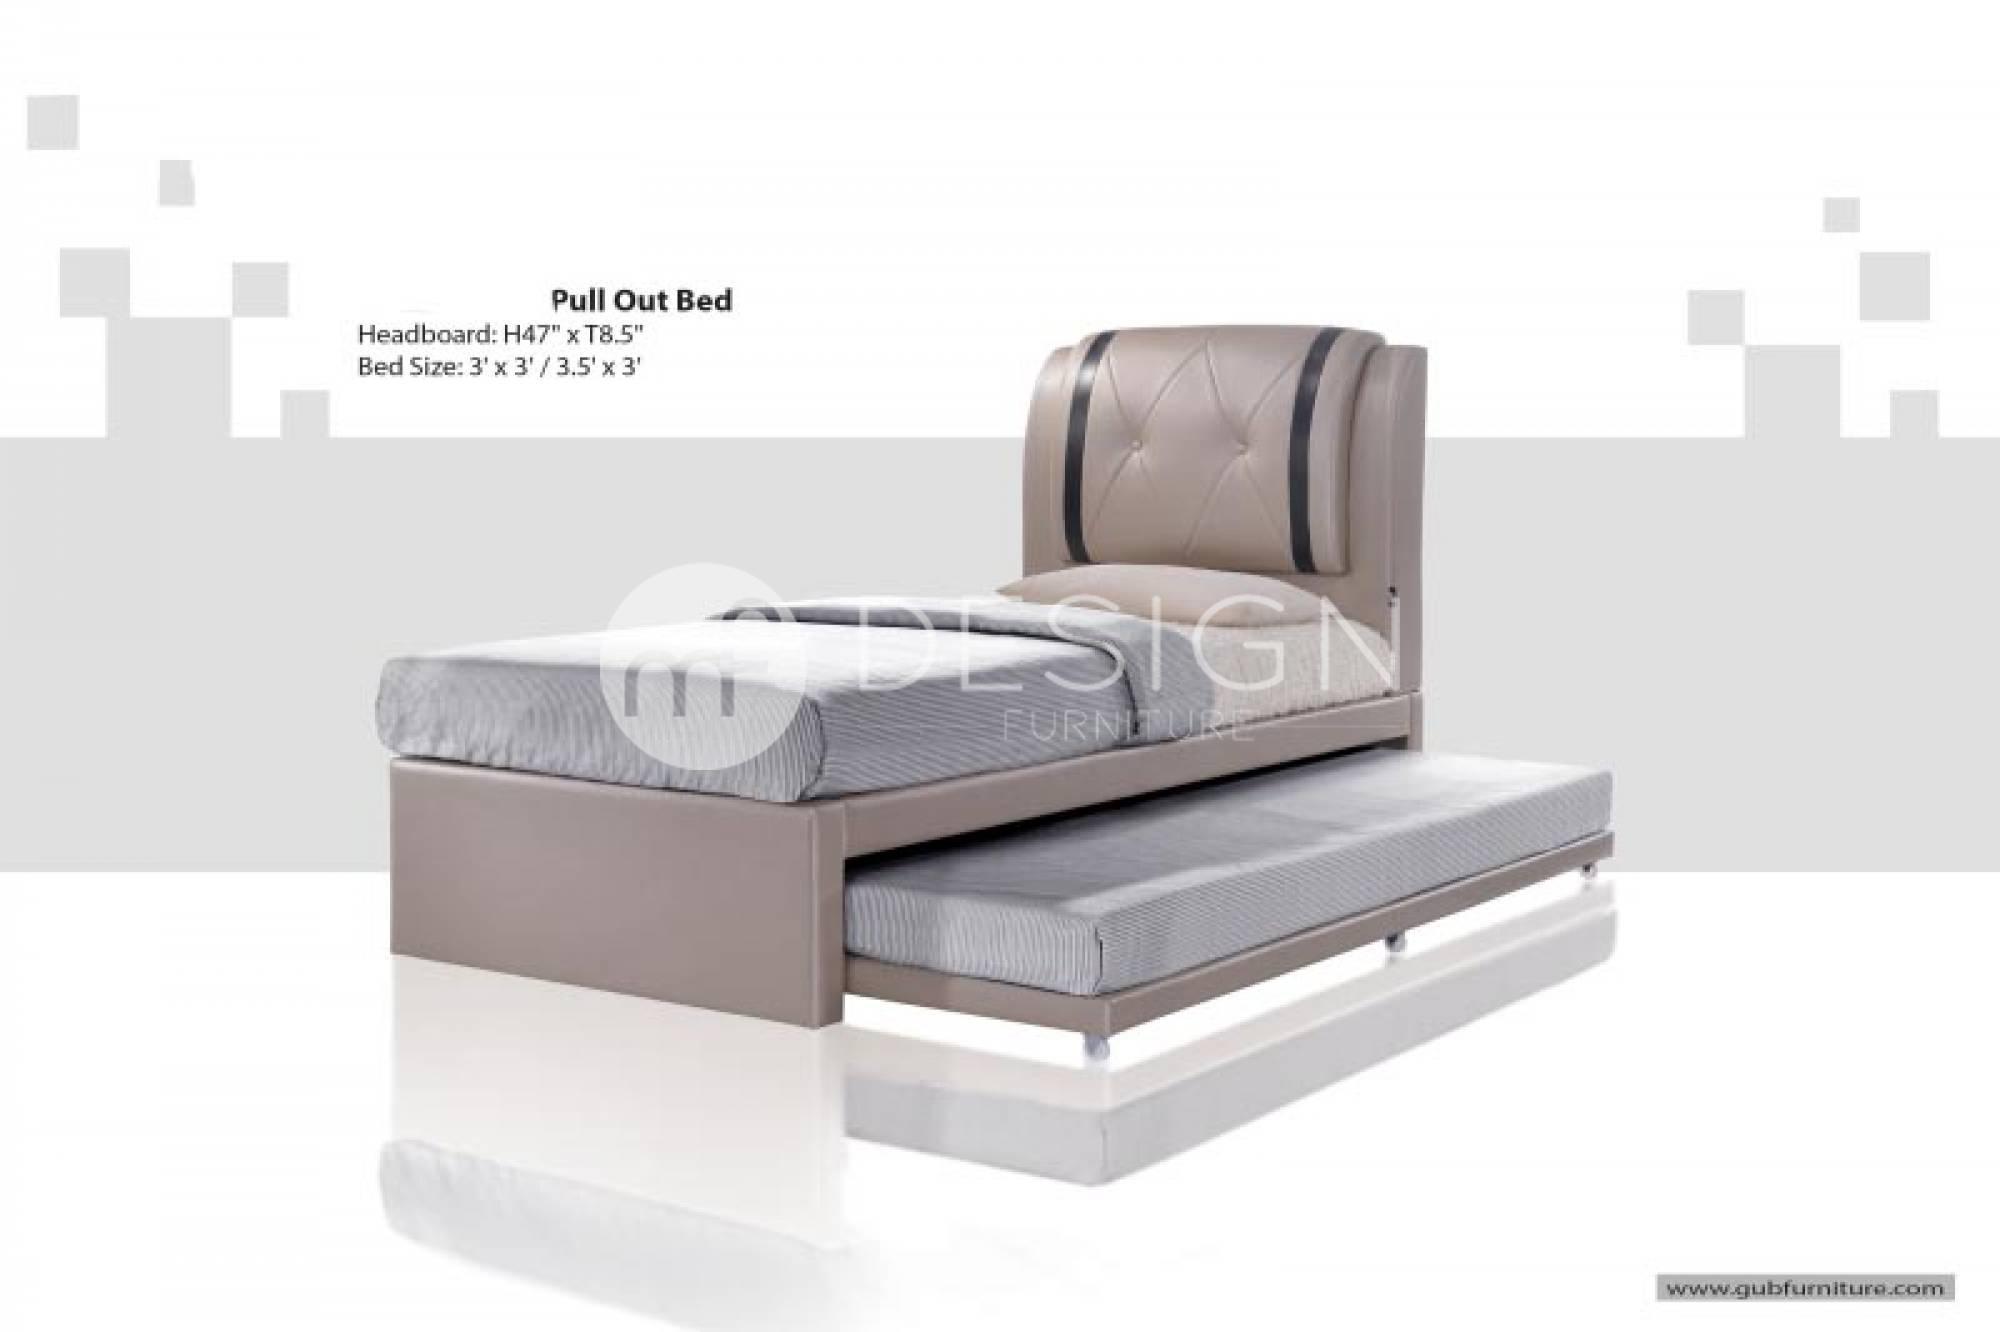 single bed size design. MF Design Saarland Single Pull Out Divan Bed Size K